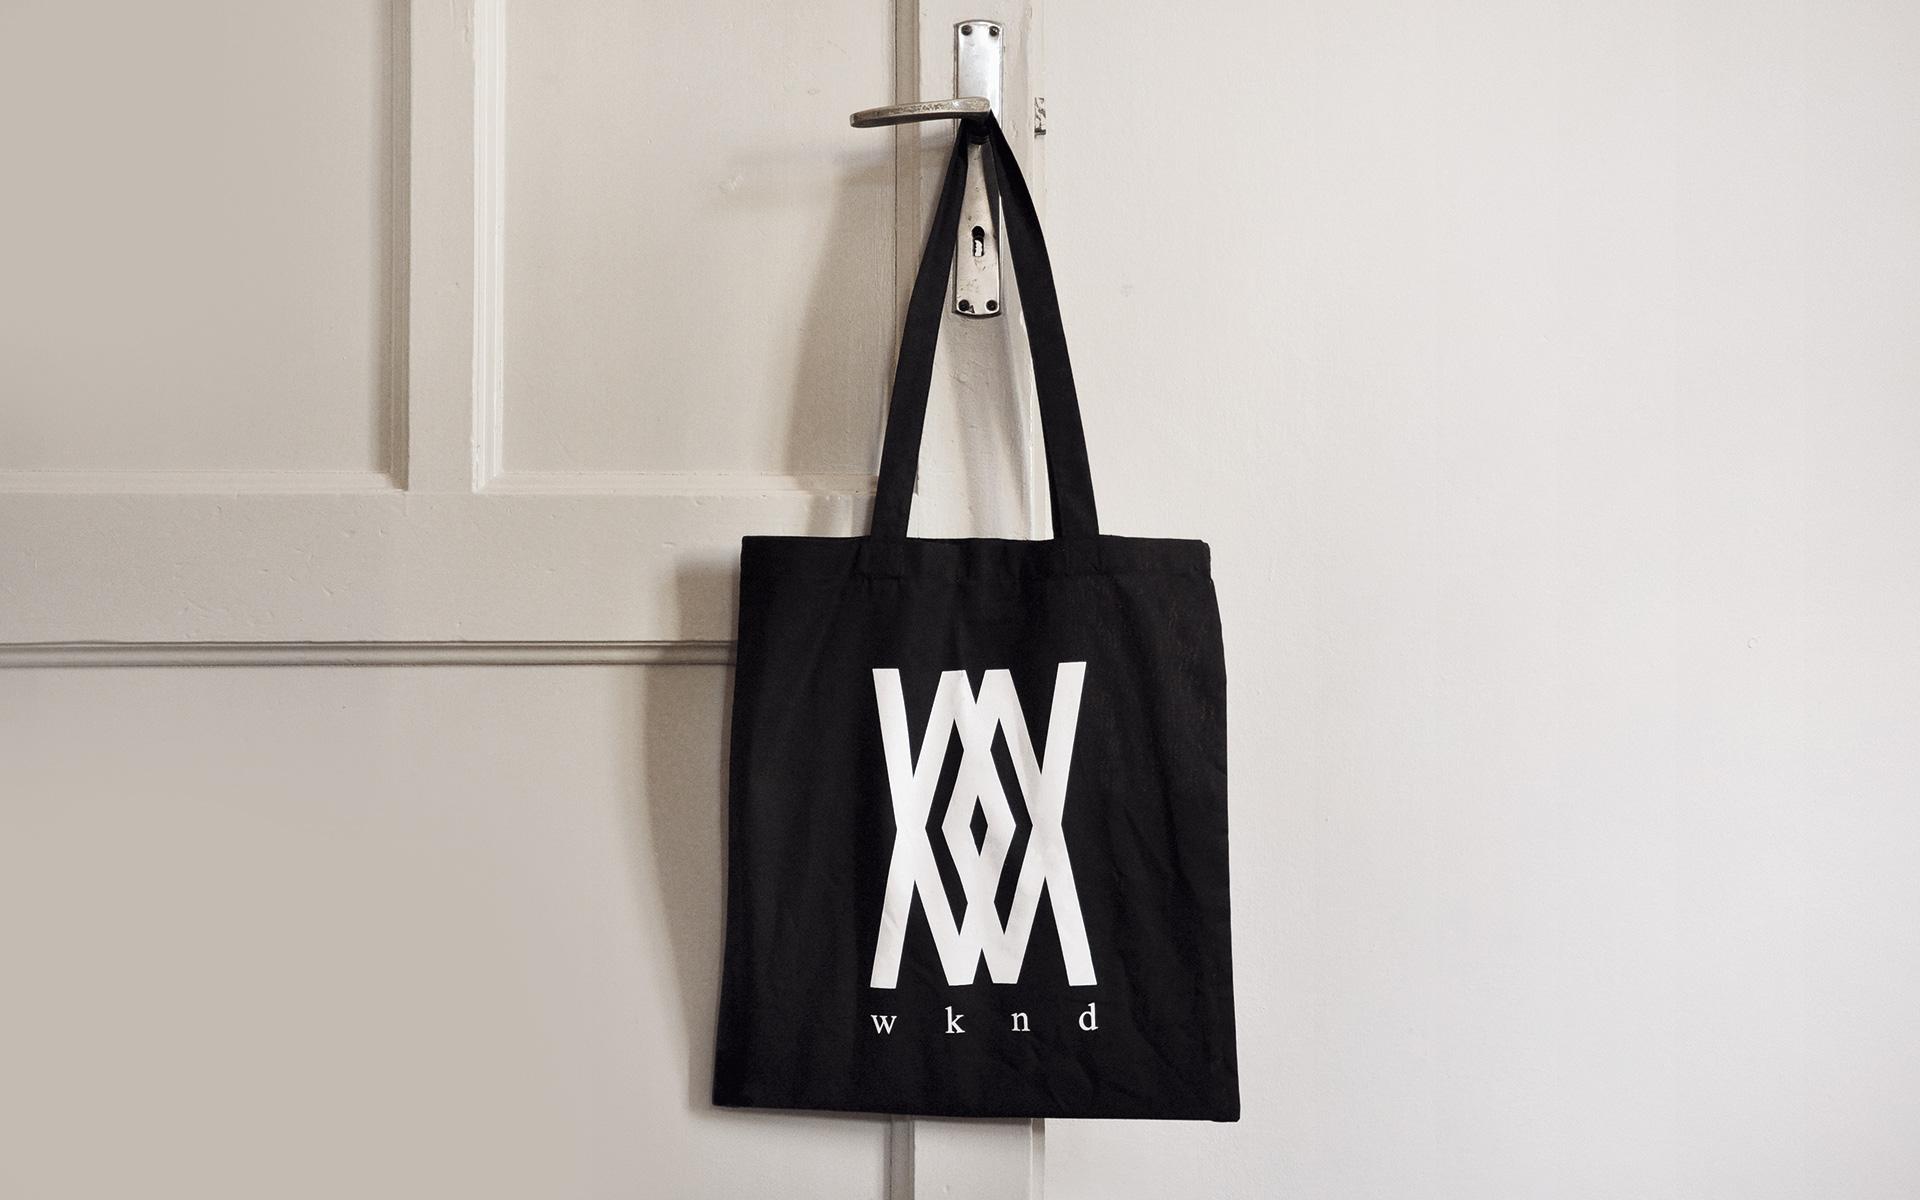 wknd_bag